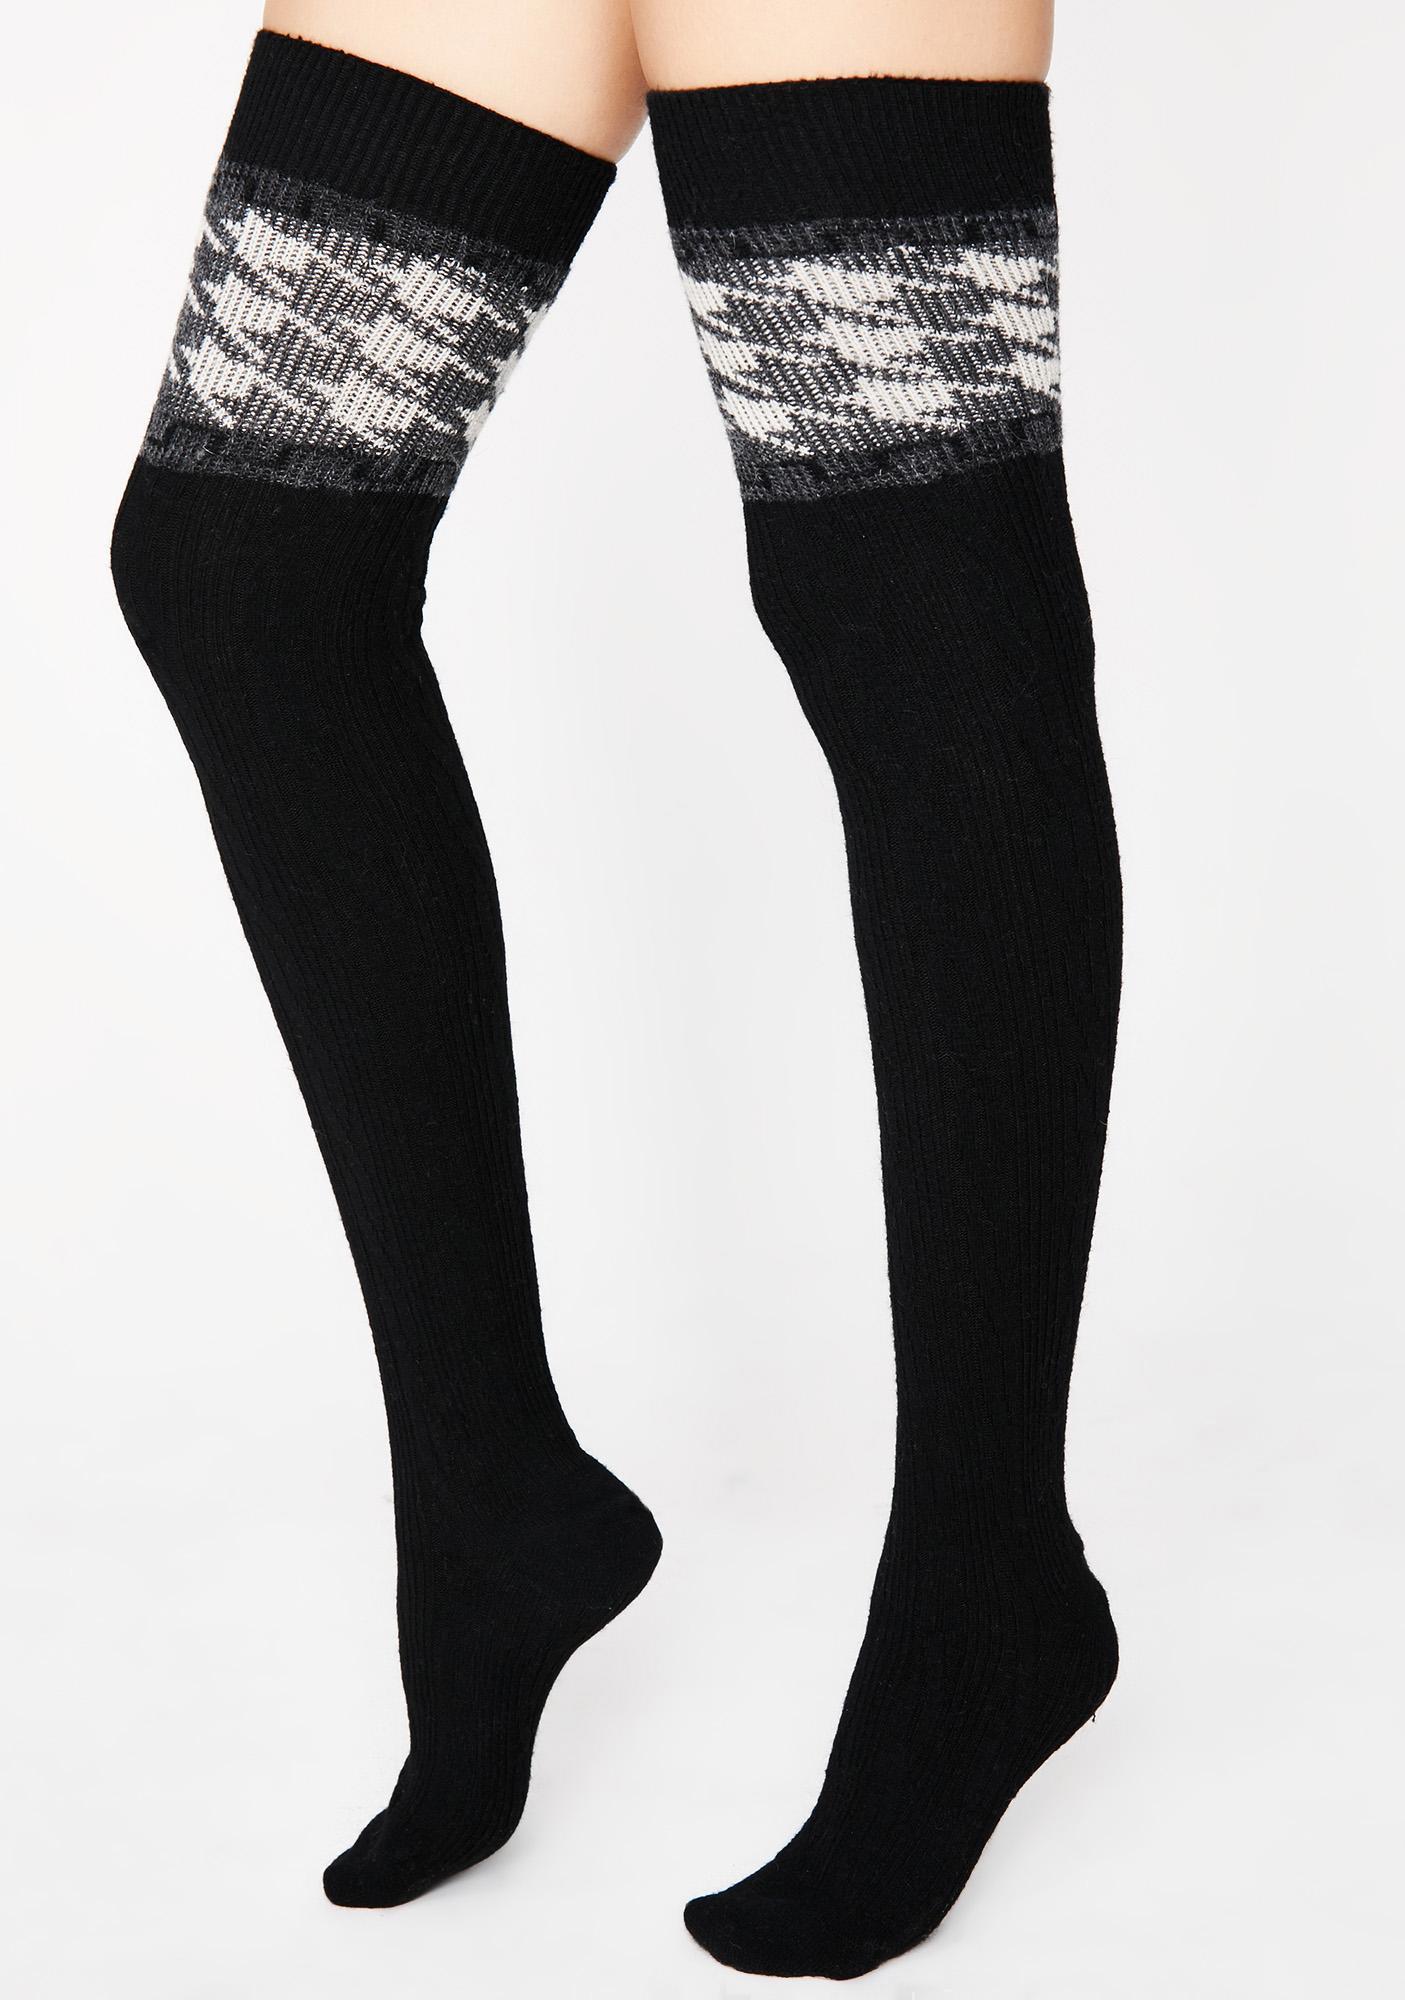 Prepped Up Thigh High Socks